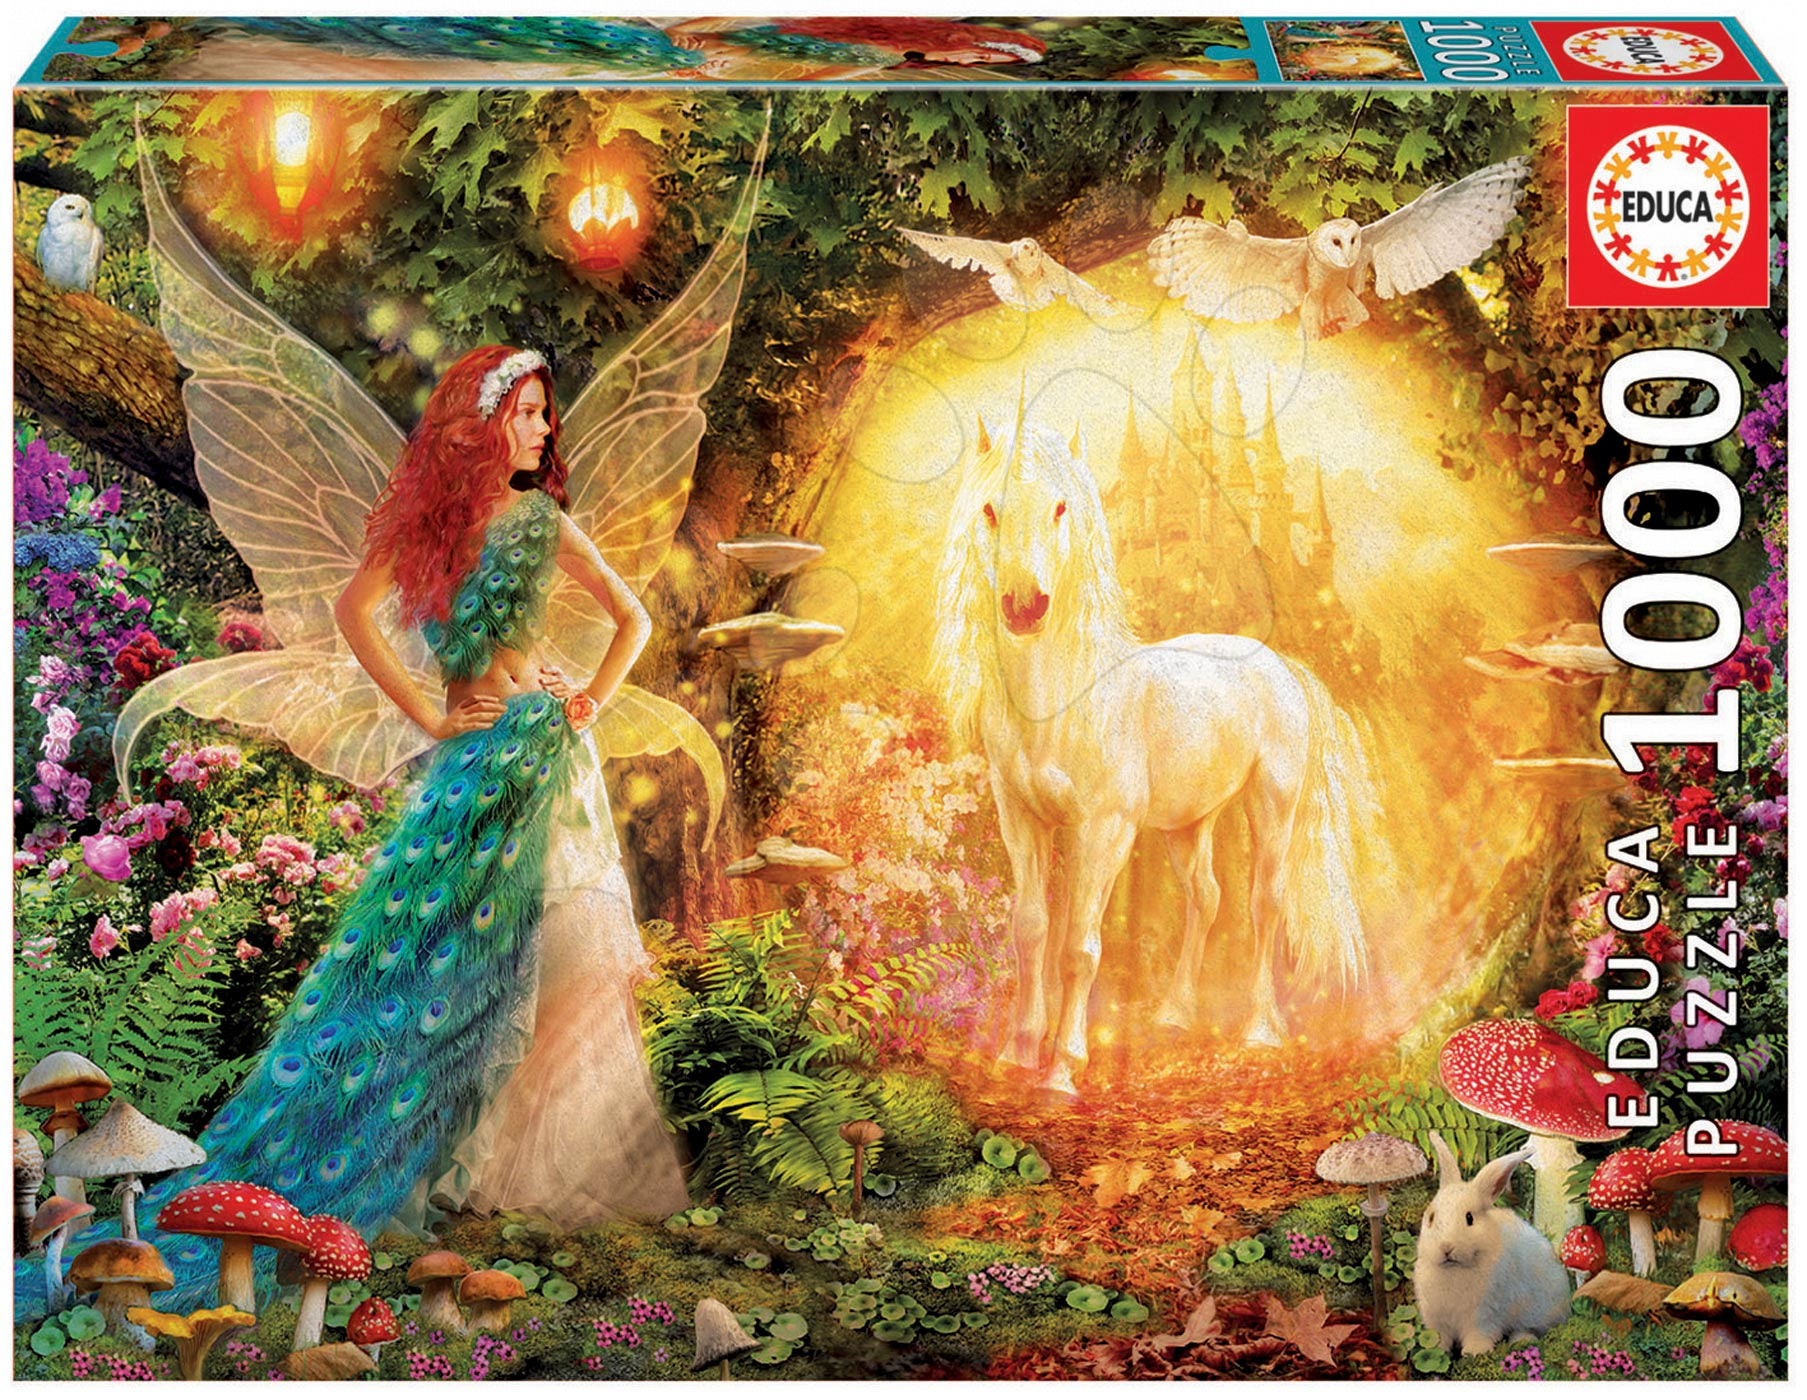 Puzzle 1000 dielne - Puzzle Genuine Peacock Feather Fairy Educa 1000 dielov od 12 rokov